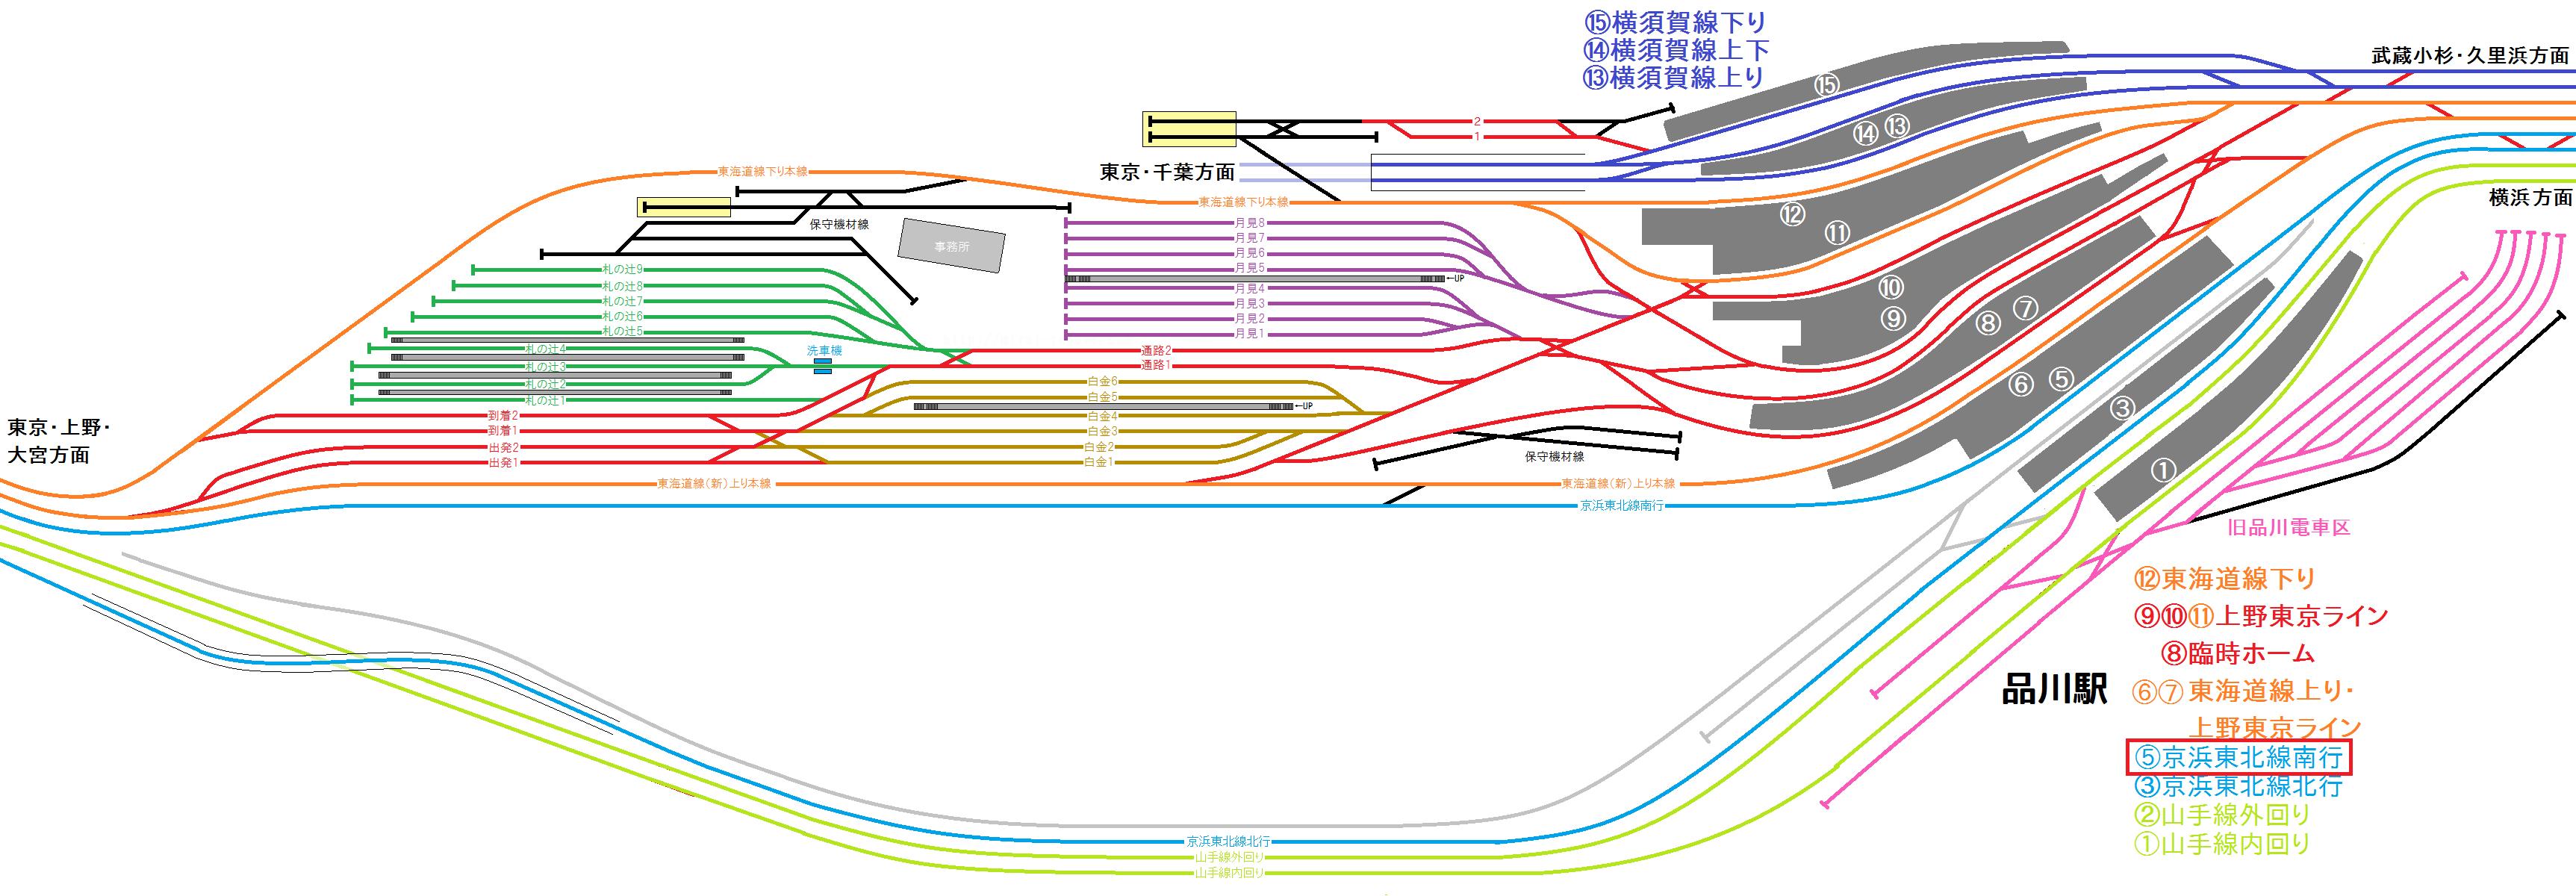 2018年6月以降の品川駅構内配線図